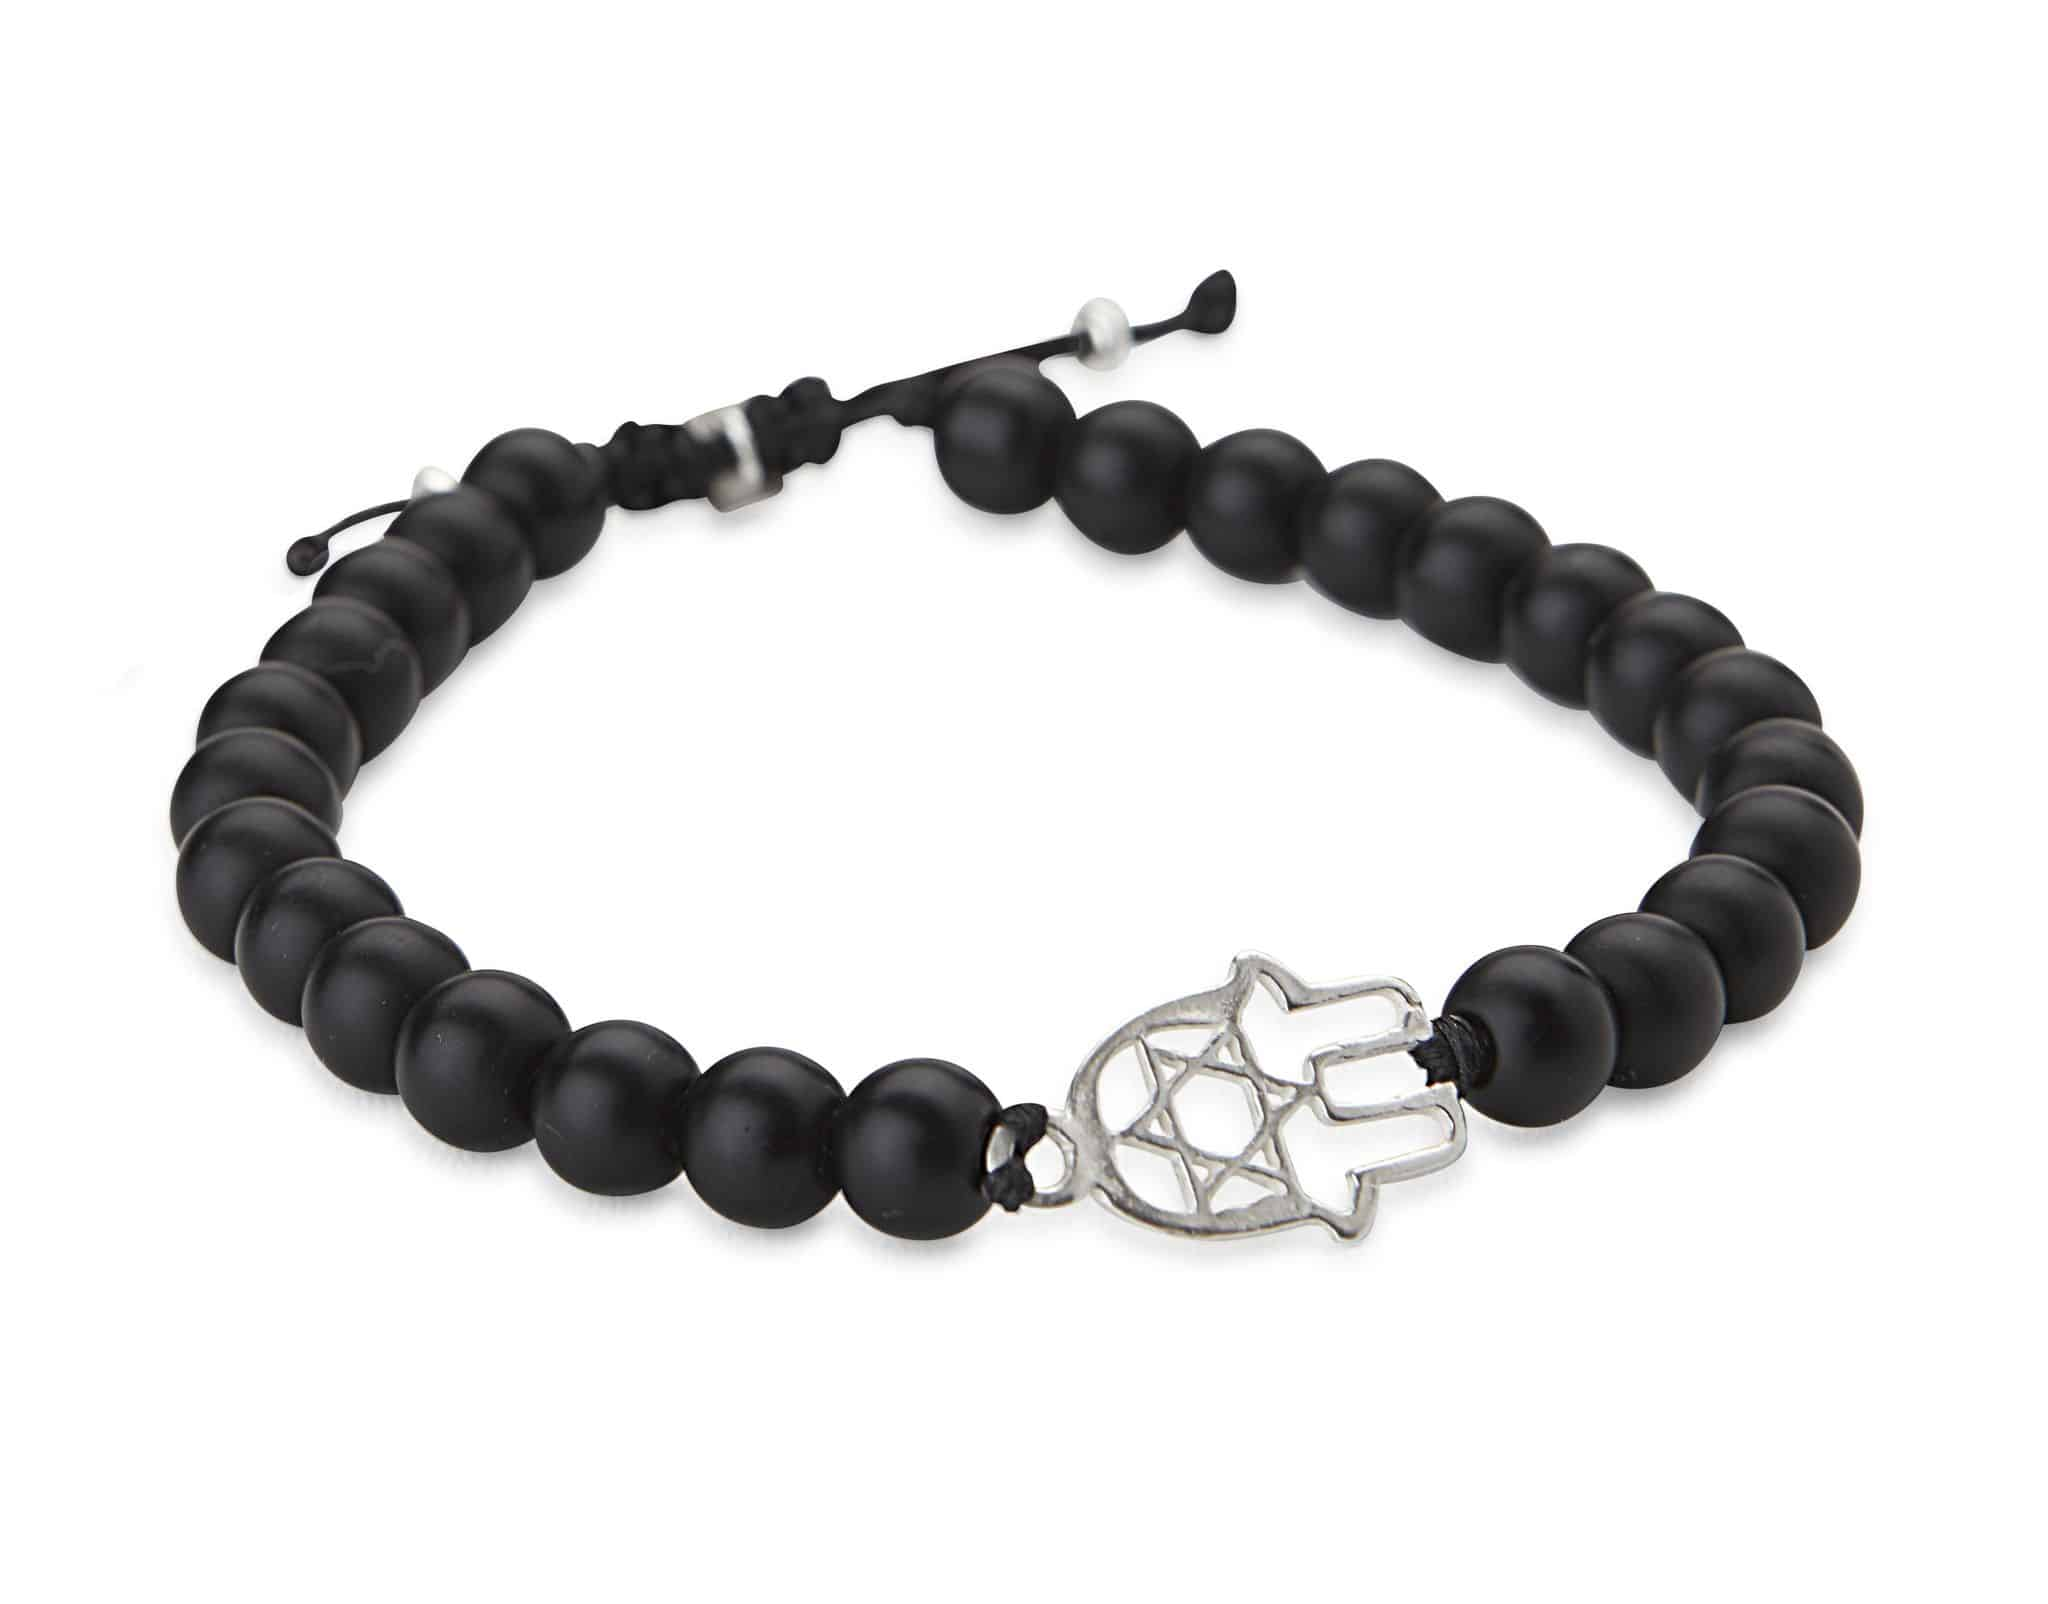 Black stones and hamsa bracelet